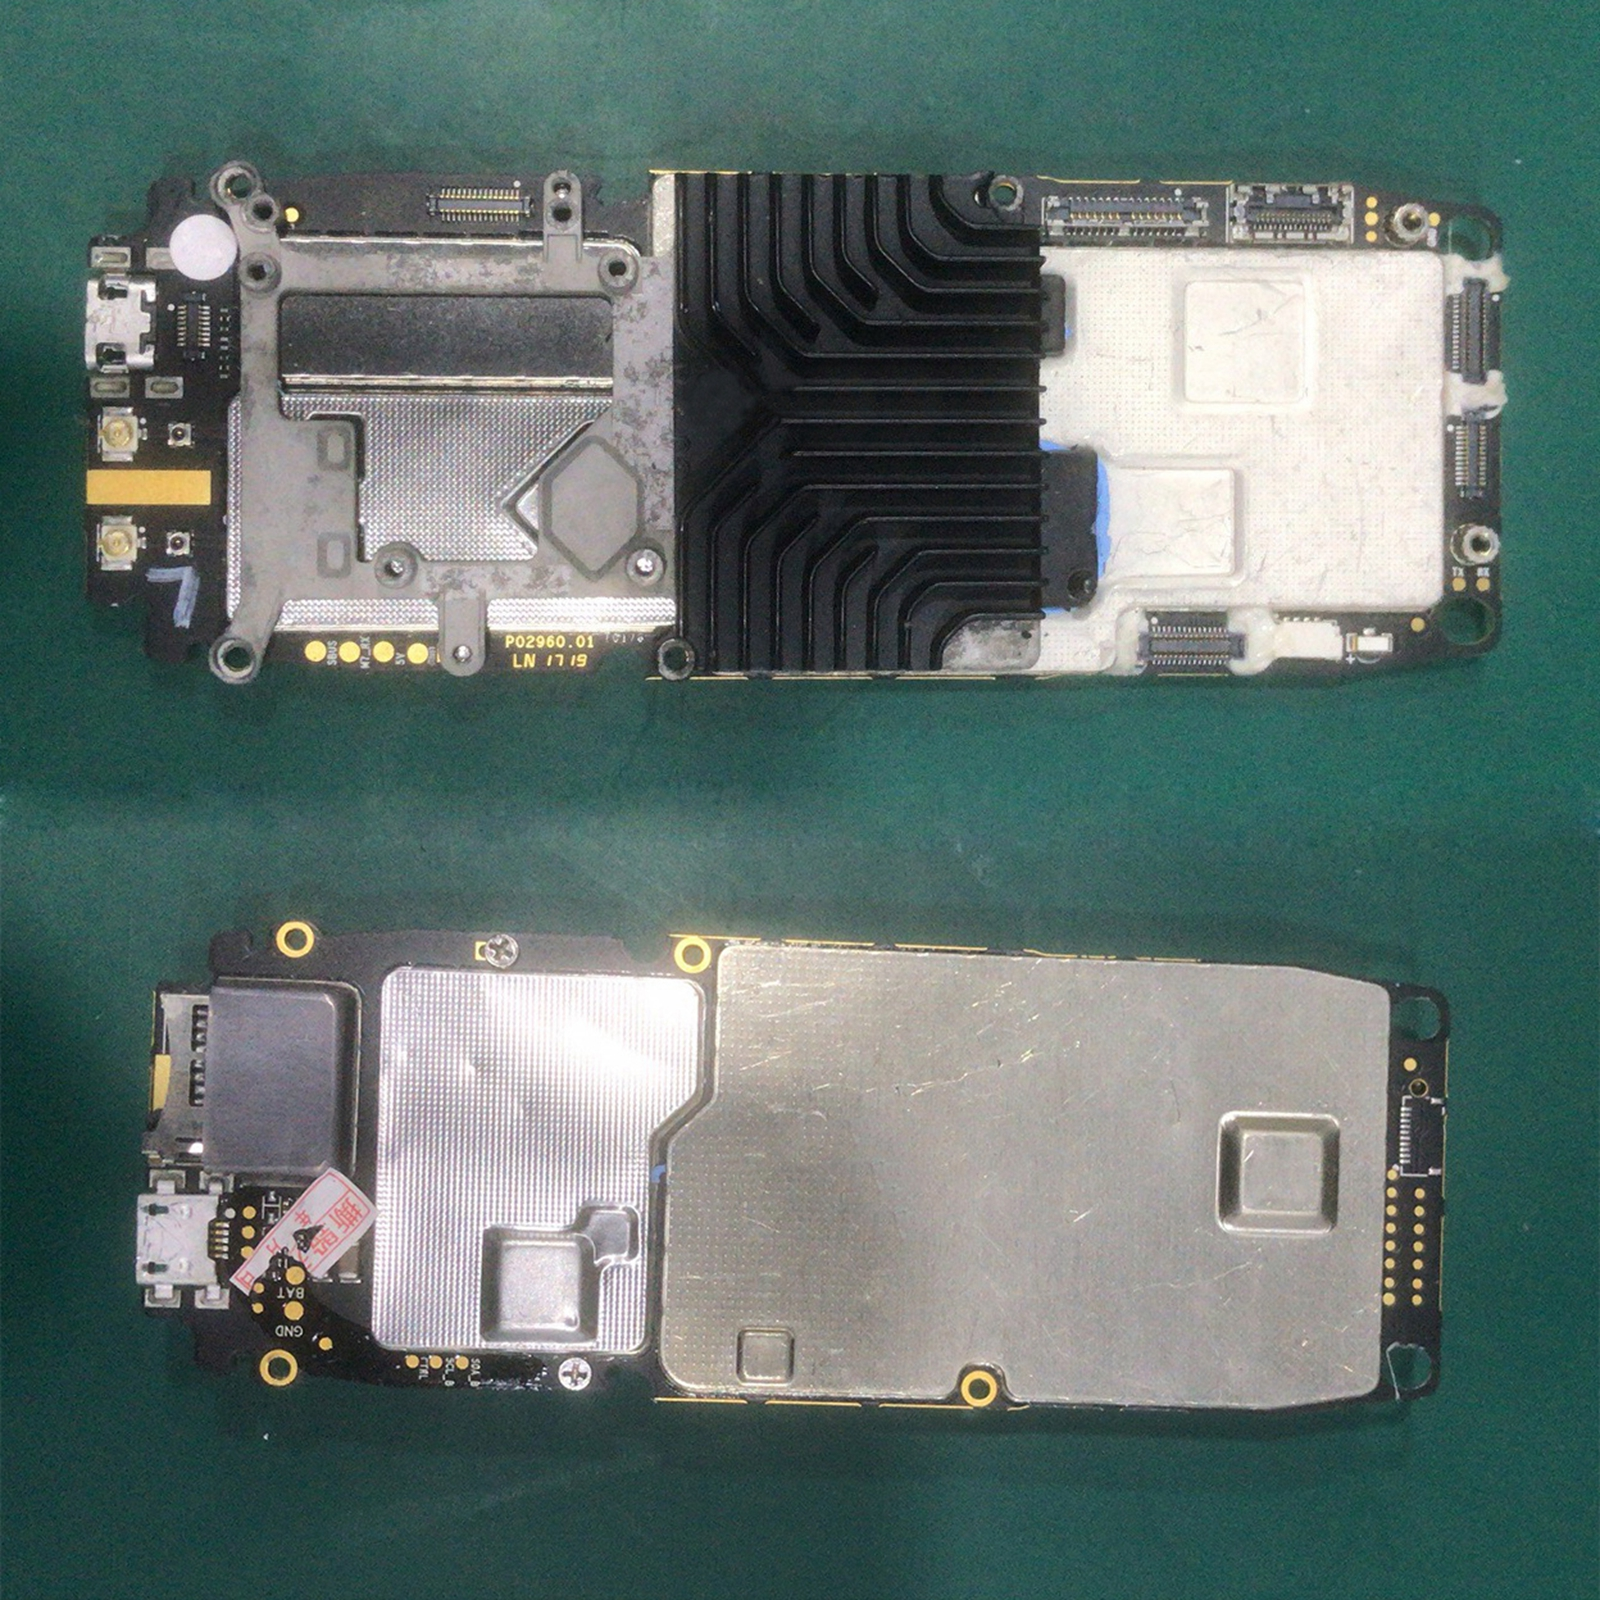 Original Main Board Repair Parts For DJI Spark Accessories Mainboard Core Board Motherboard For DJI Spark Disassemble Part(Used)